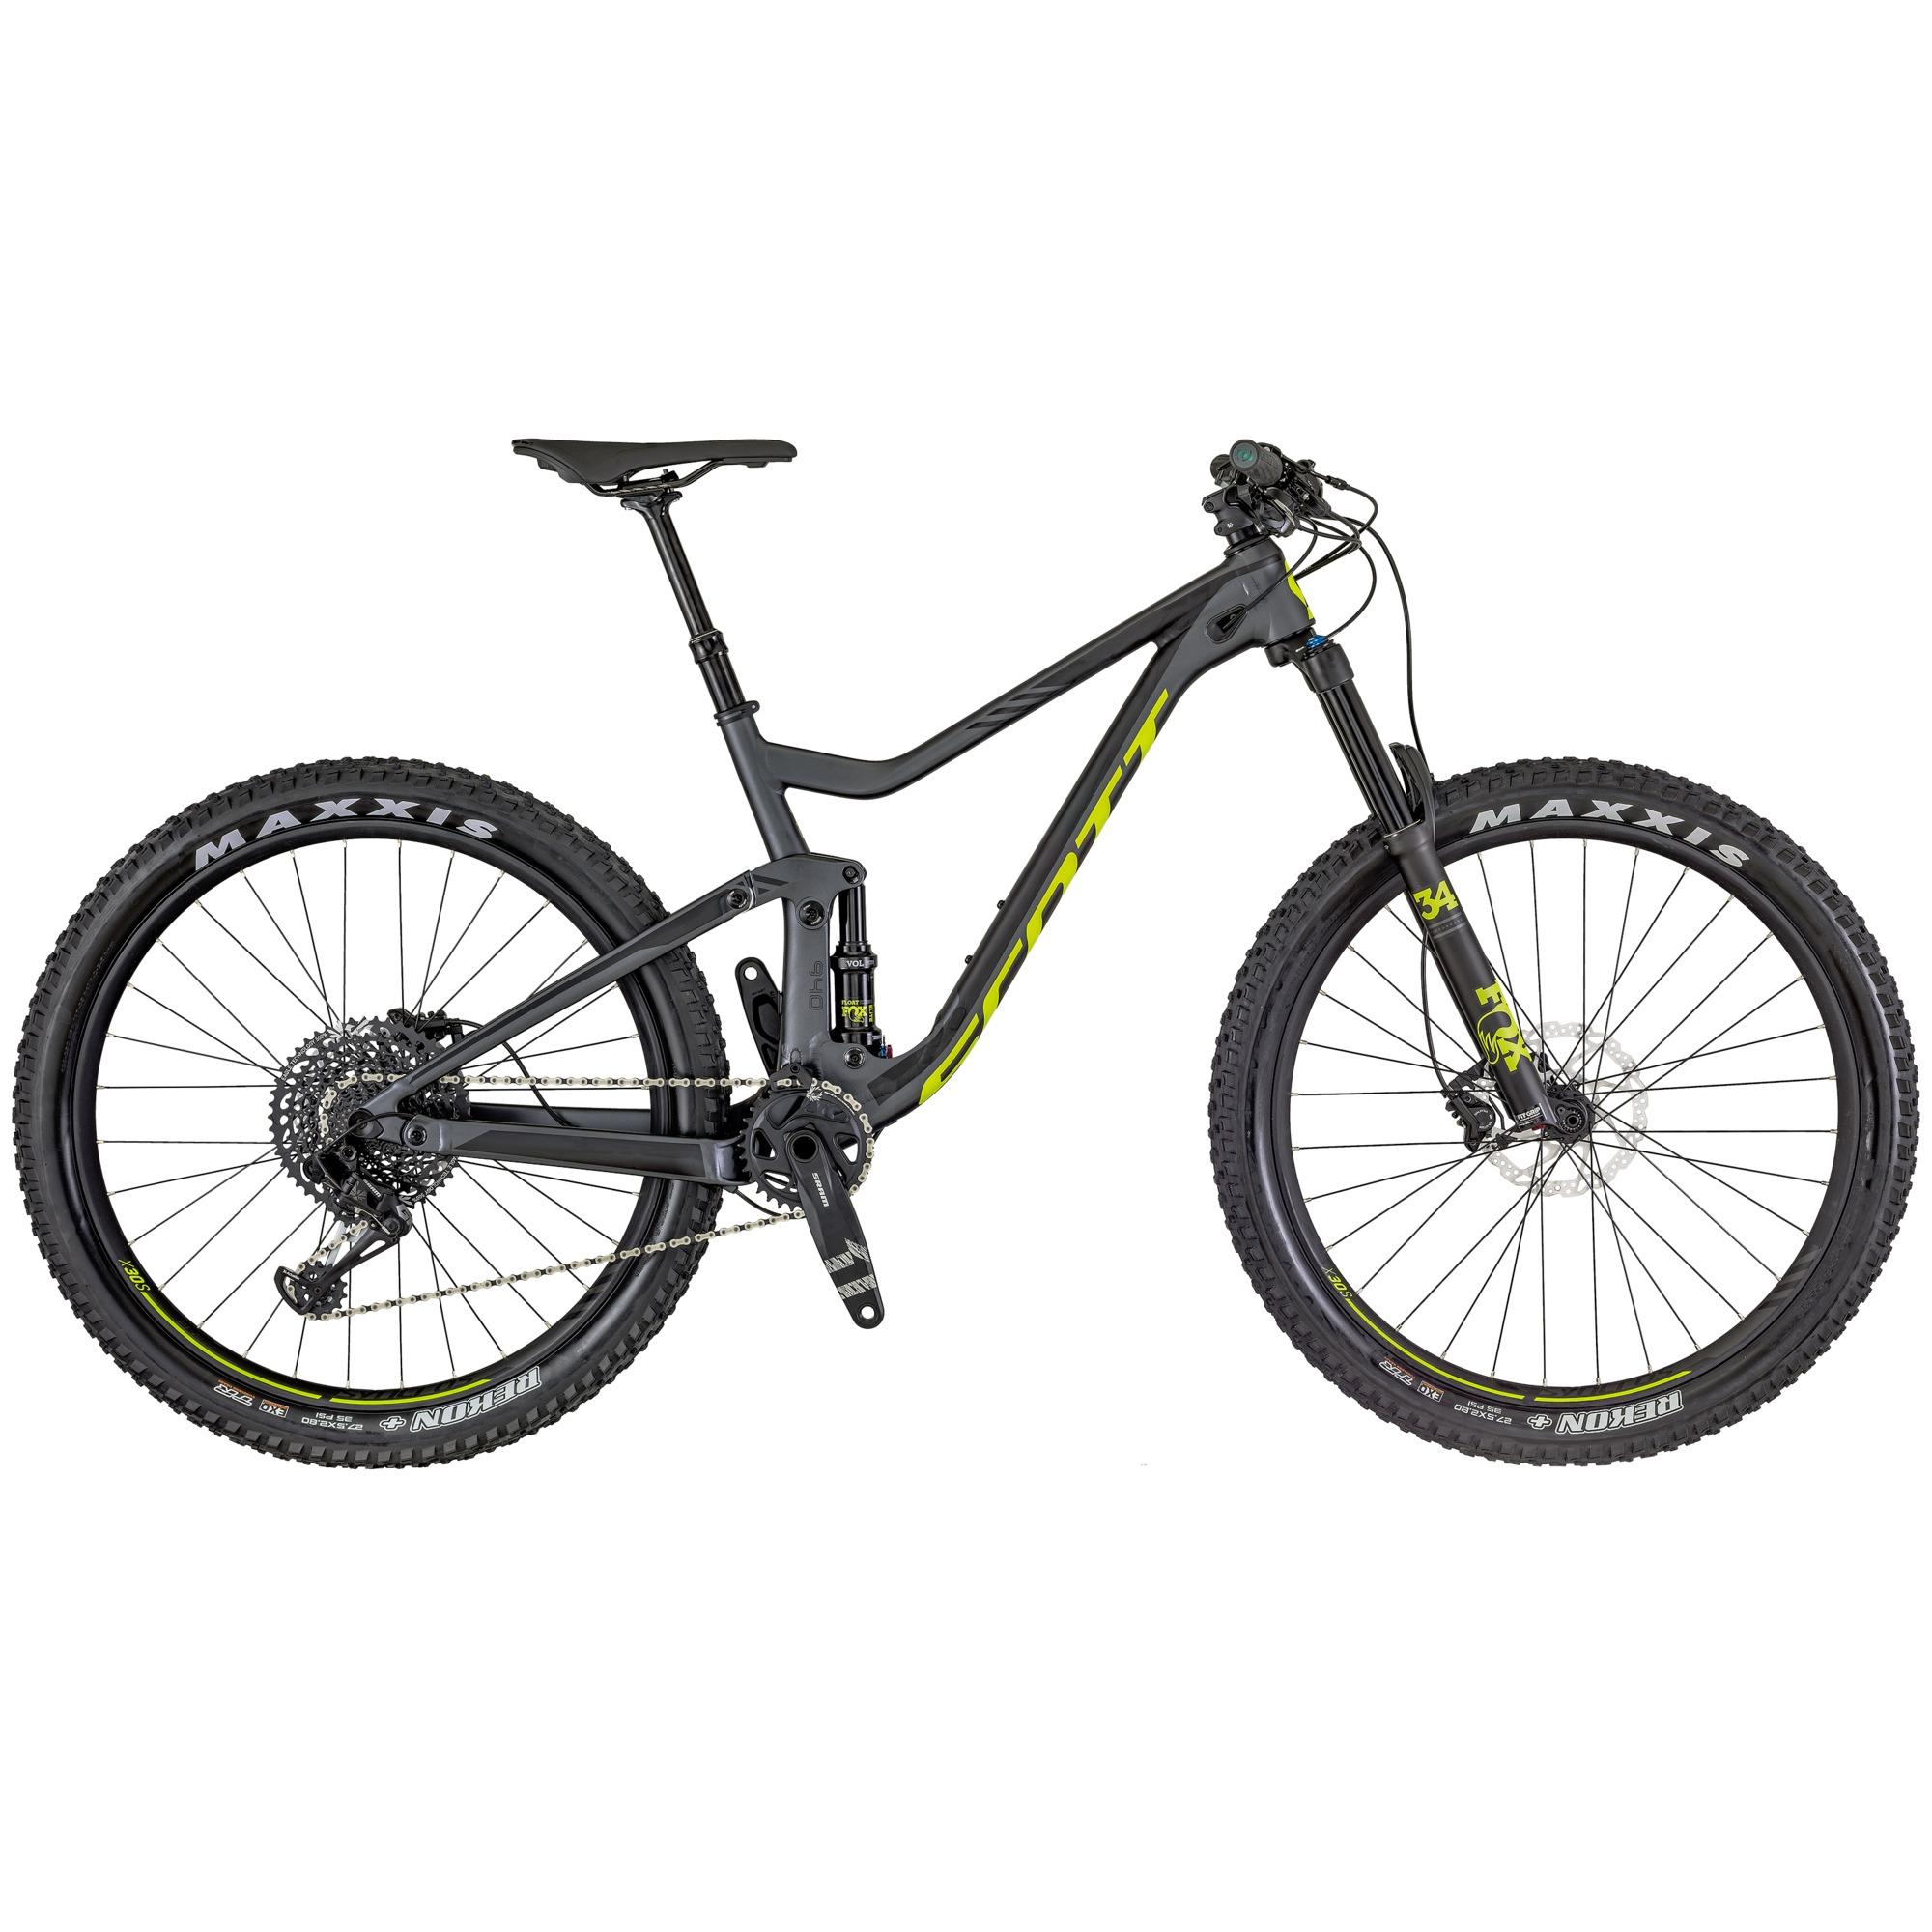 SCOTT Genius 740 Bike M - Rad & Dämpferklinik GmbH